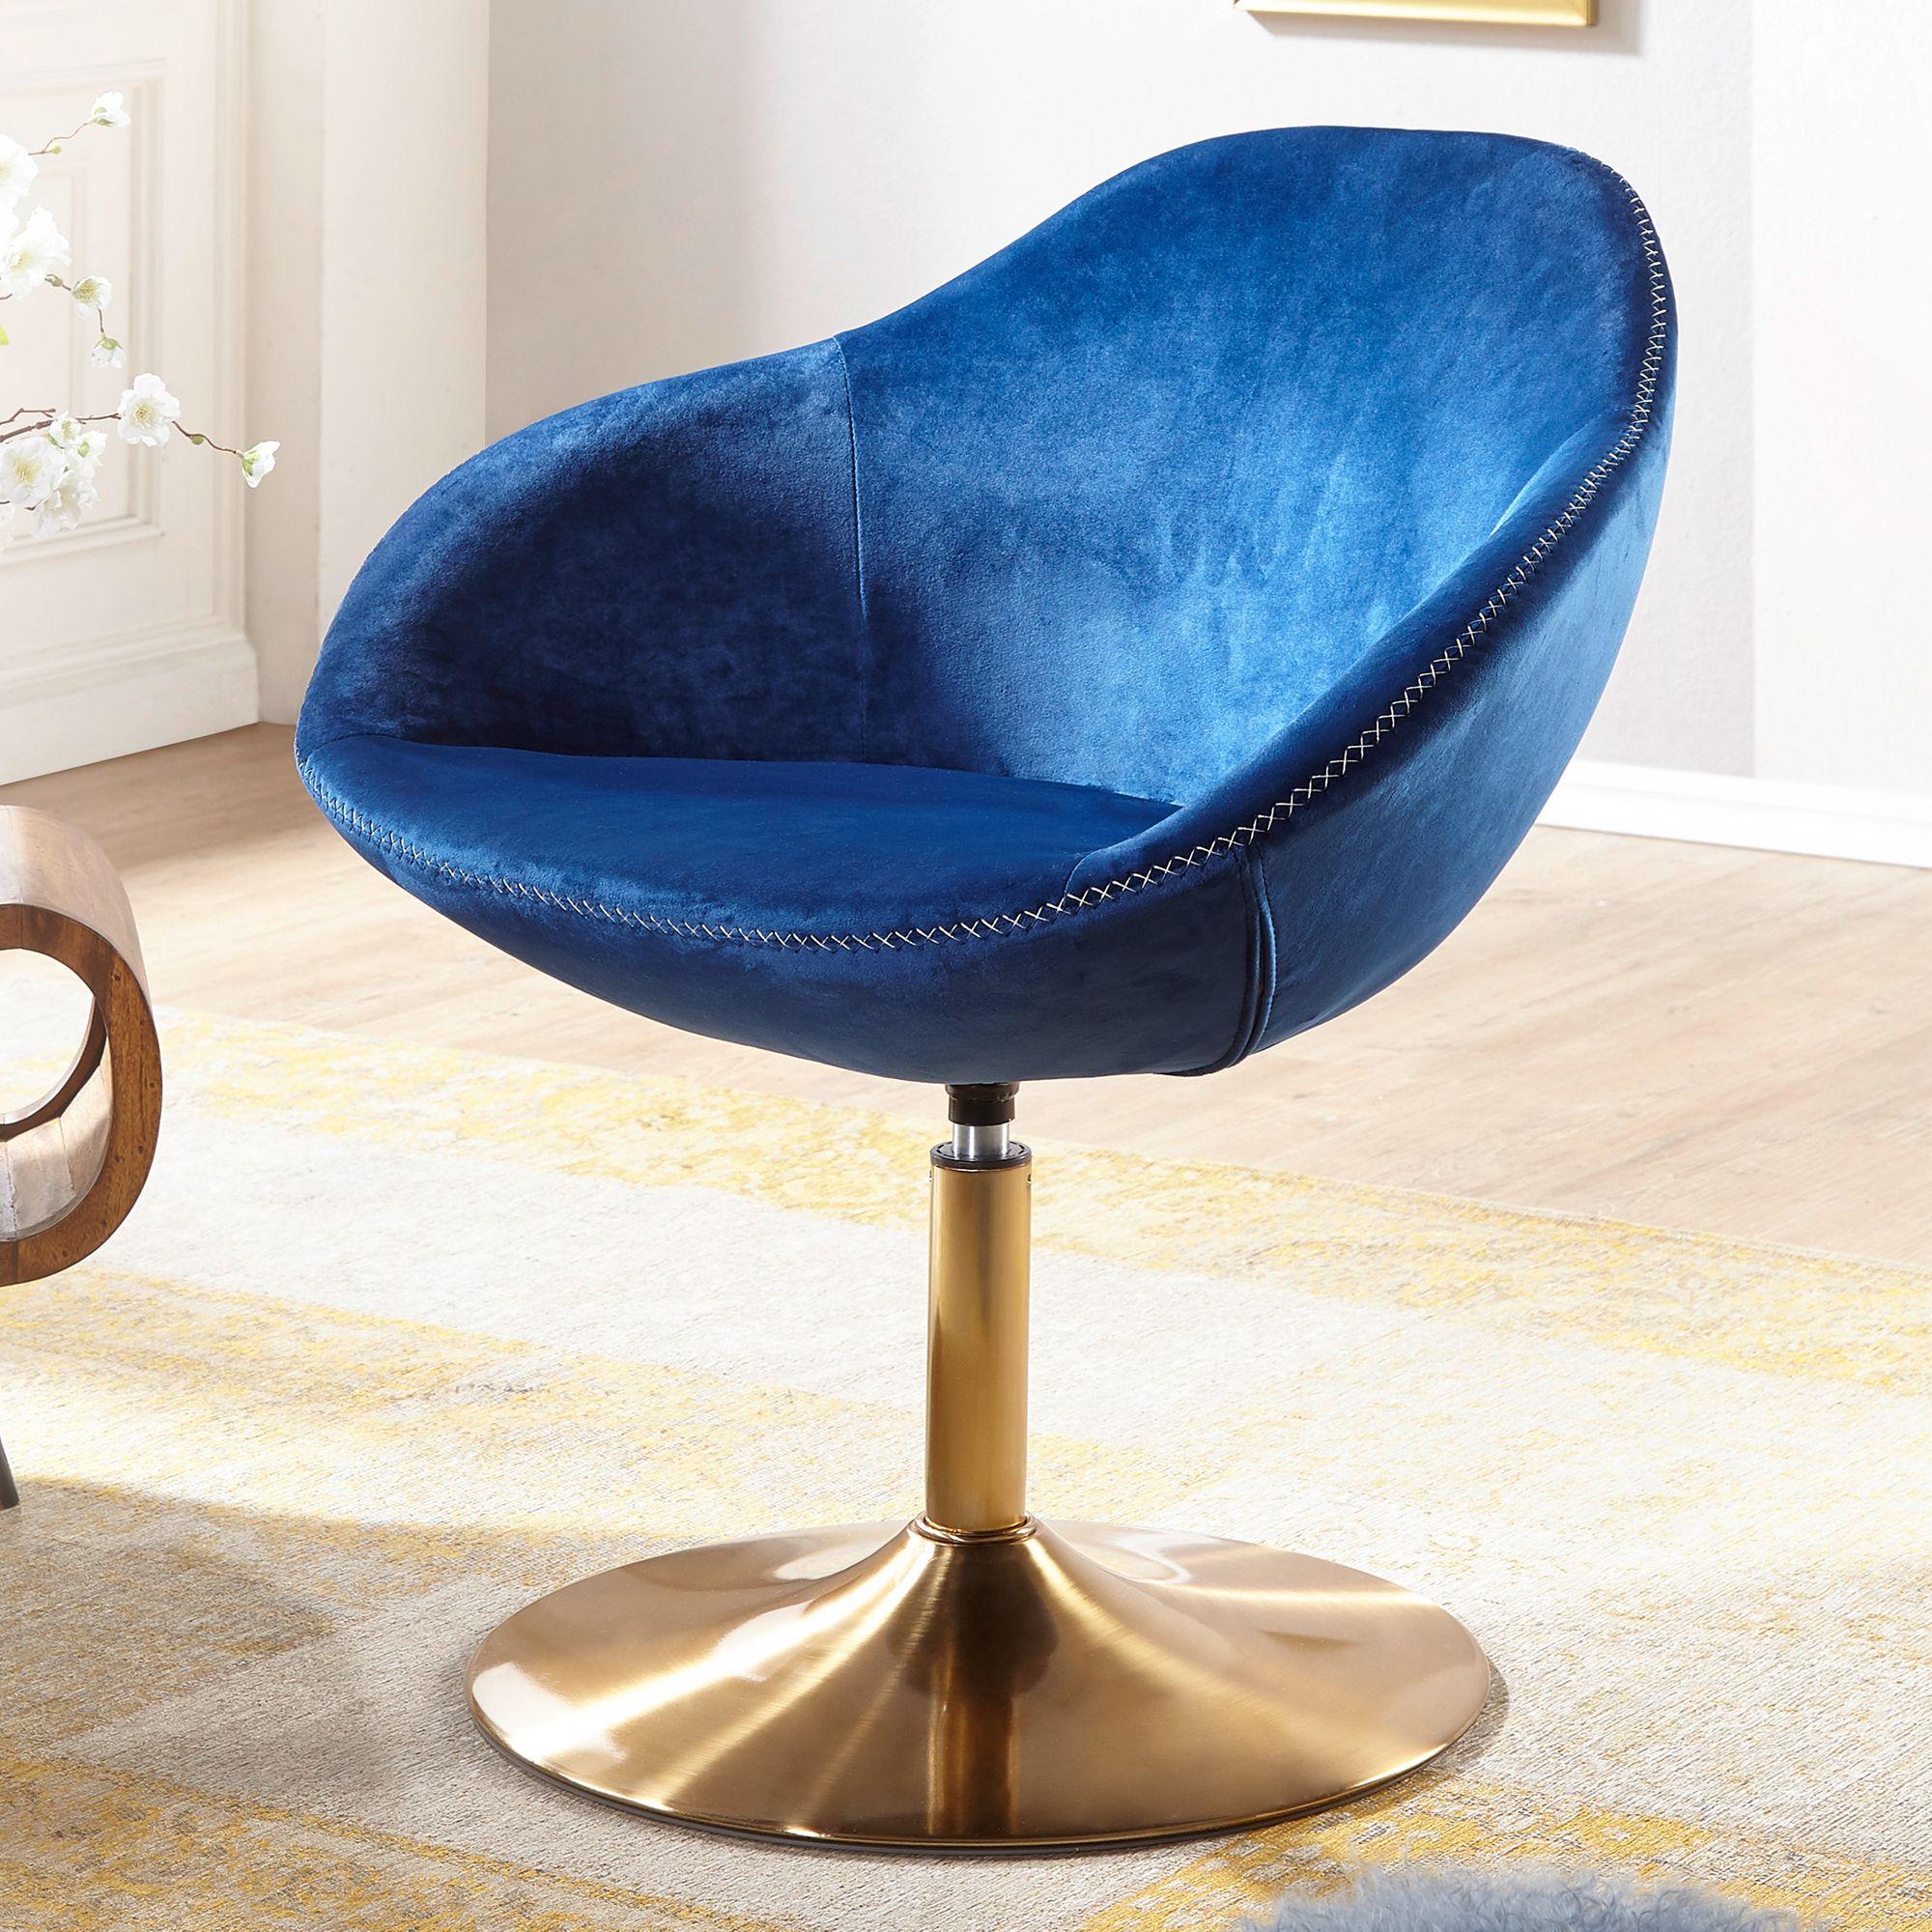 Blauwe Relax Stoelen.Lounge Fauteuil Blauw Aktiewonen Nl